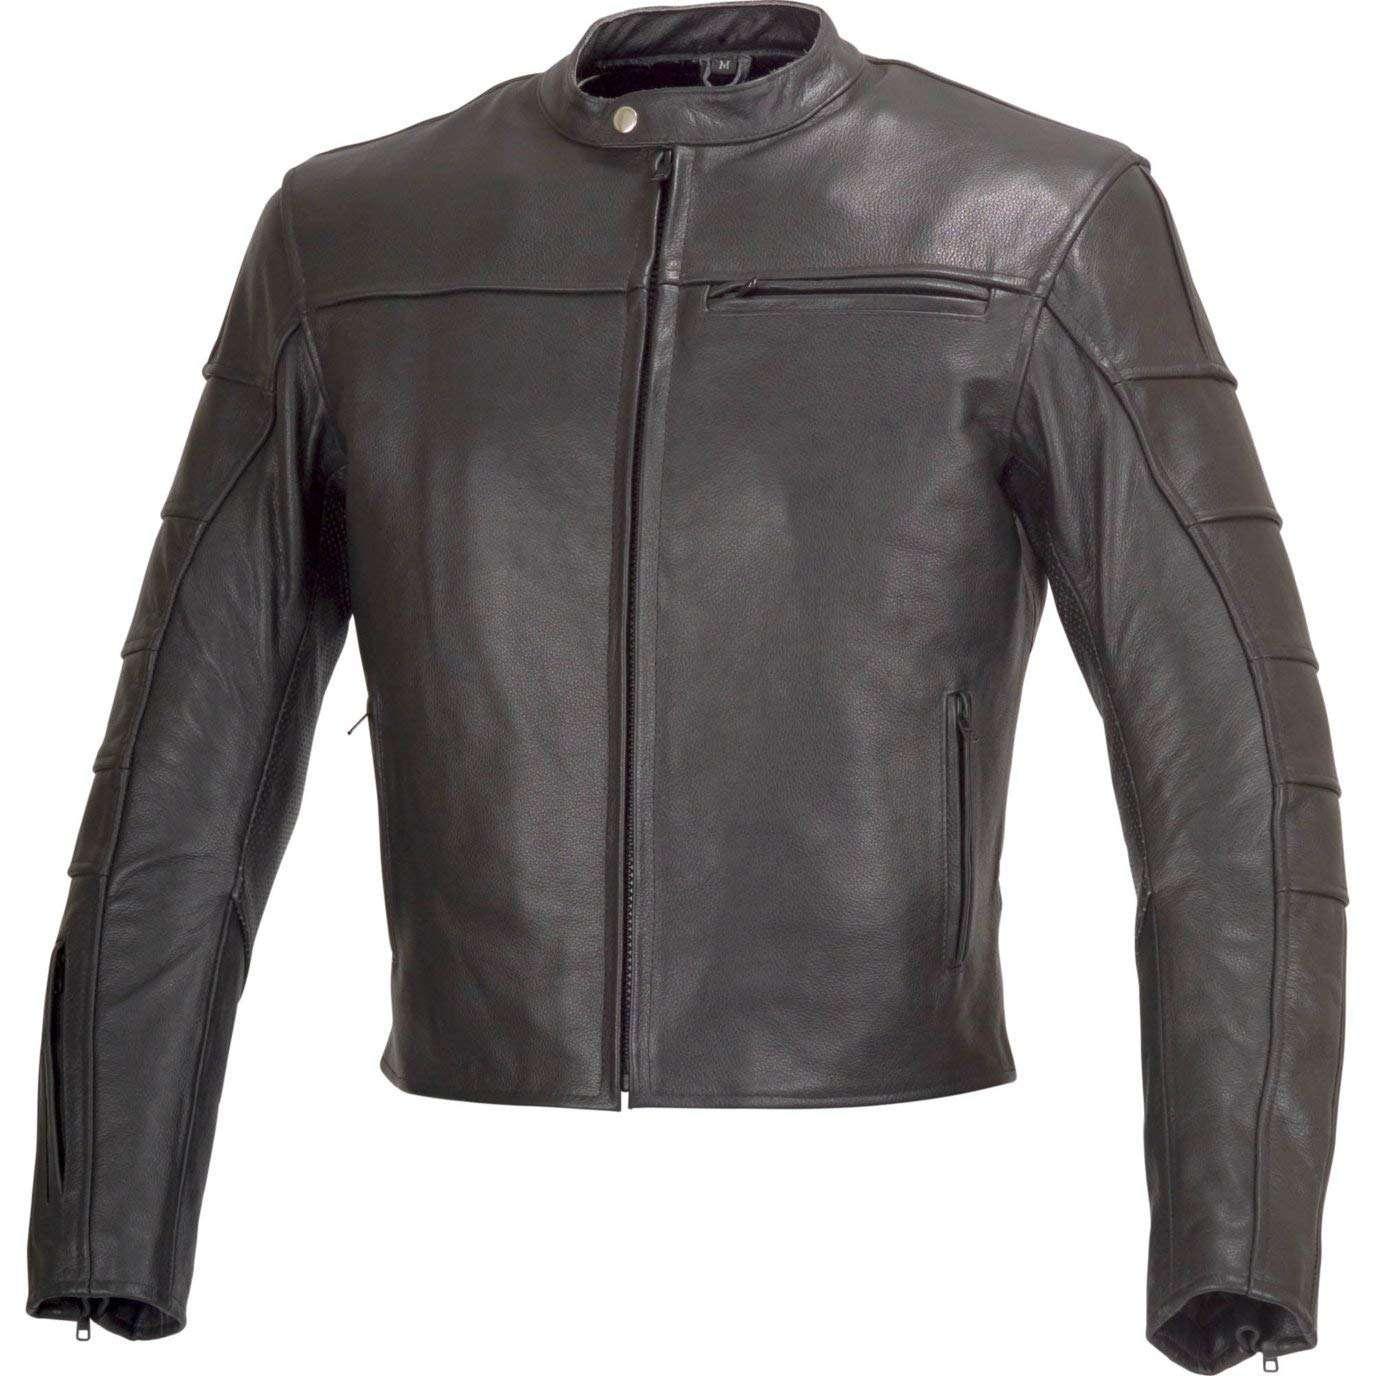 Motorcycle-Leather-Jacket-Cafe-Racer-Style-Black-4XL